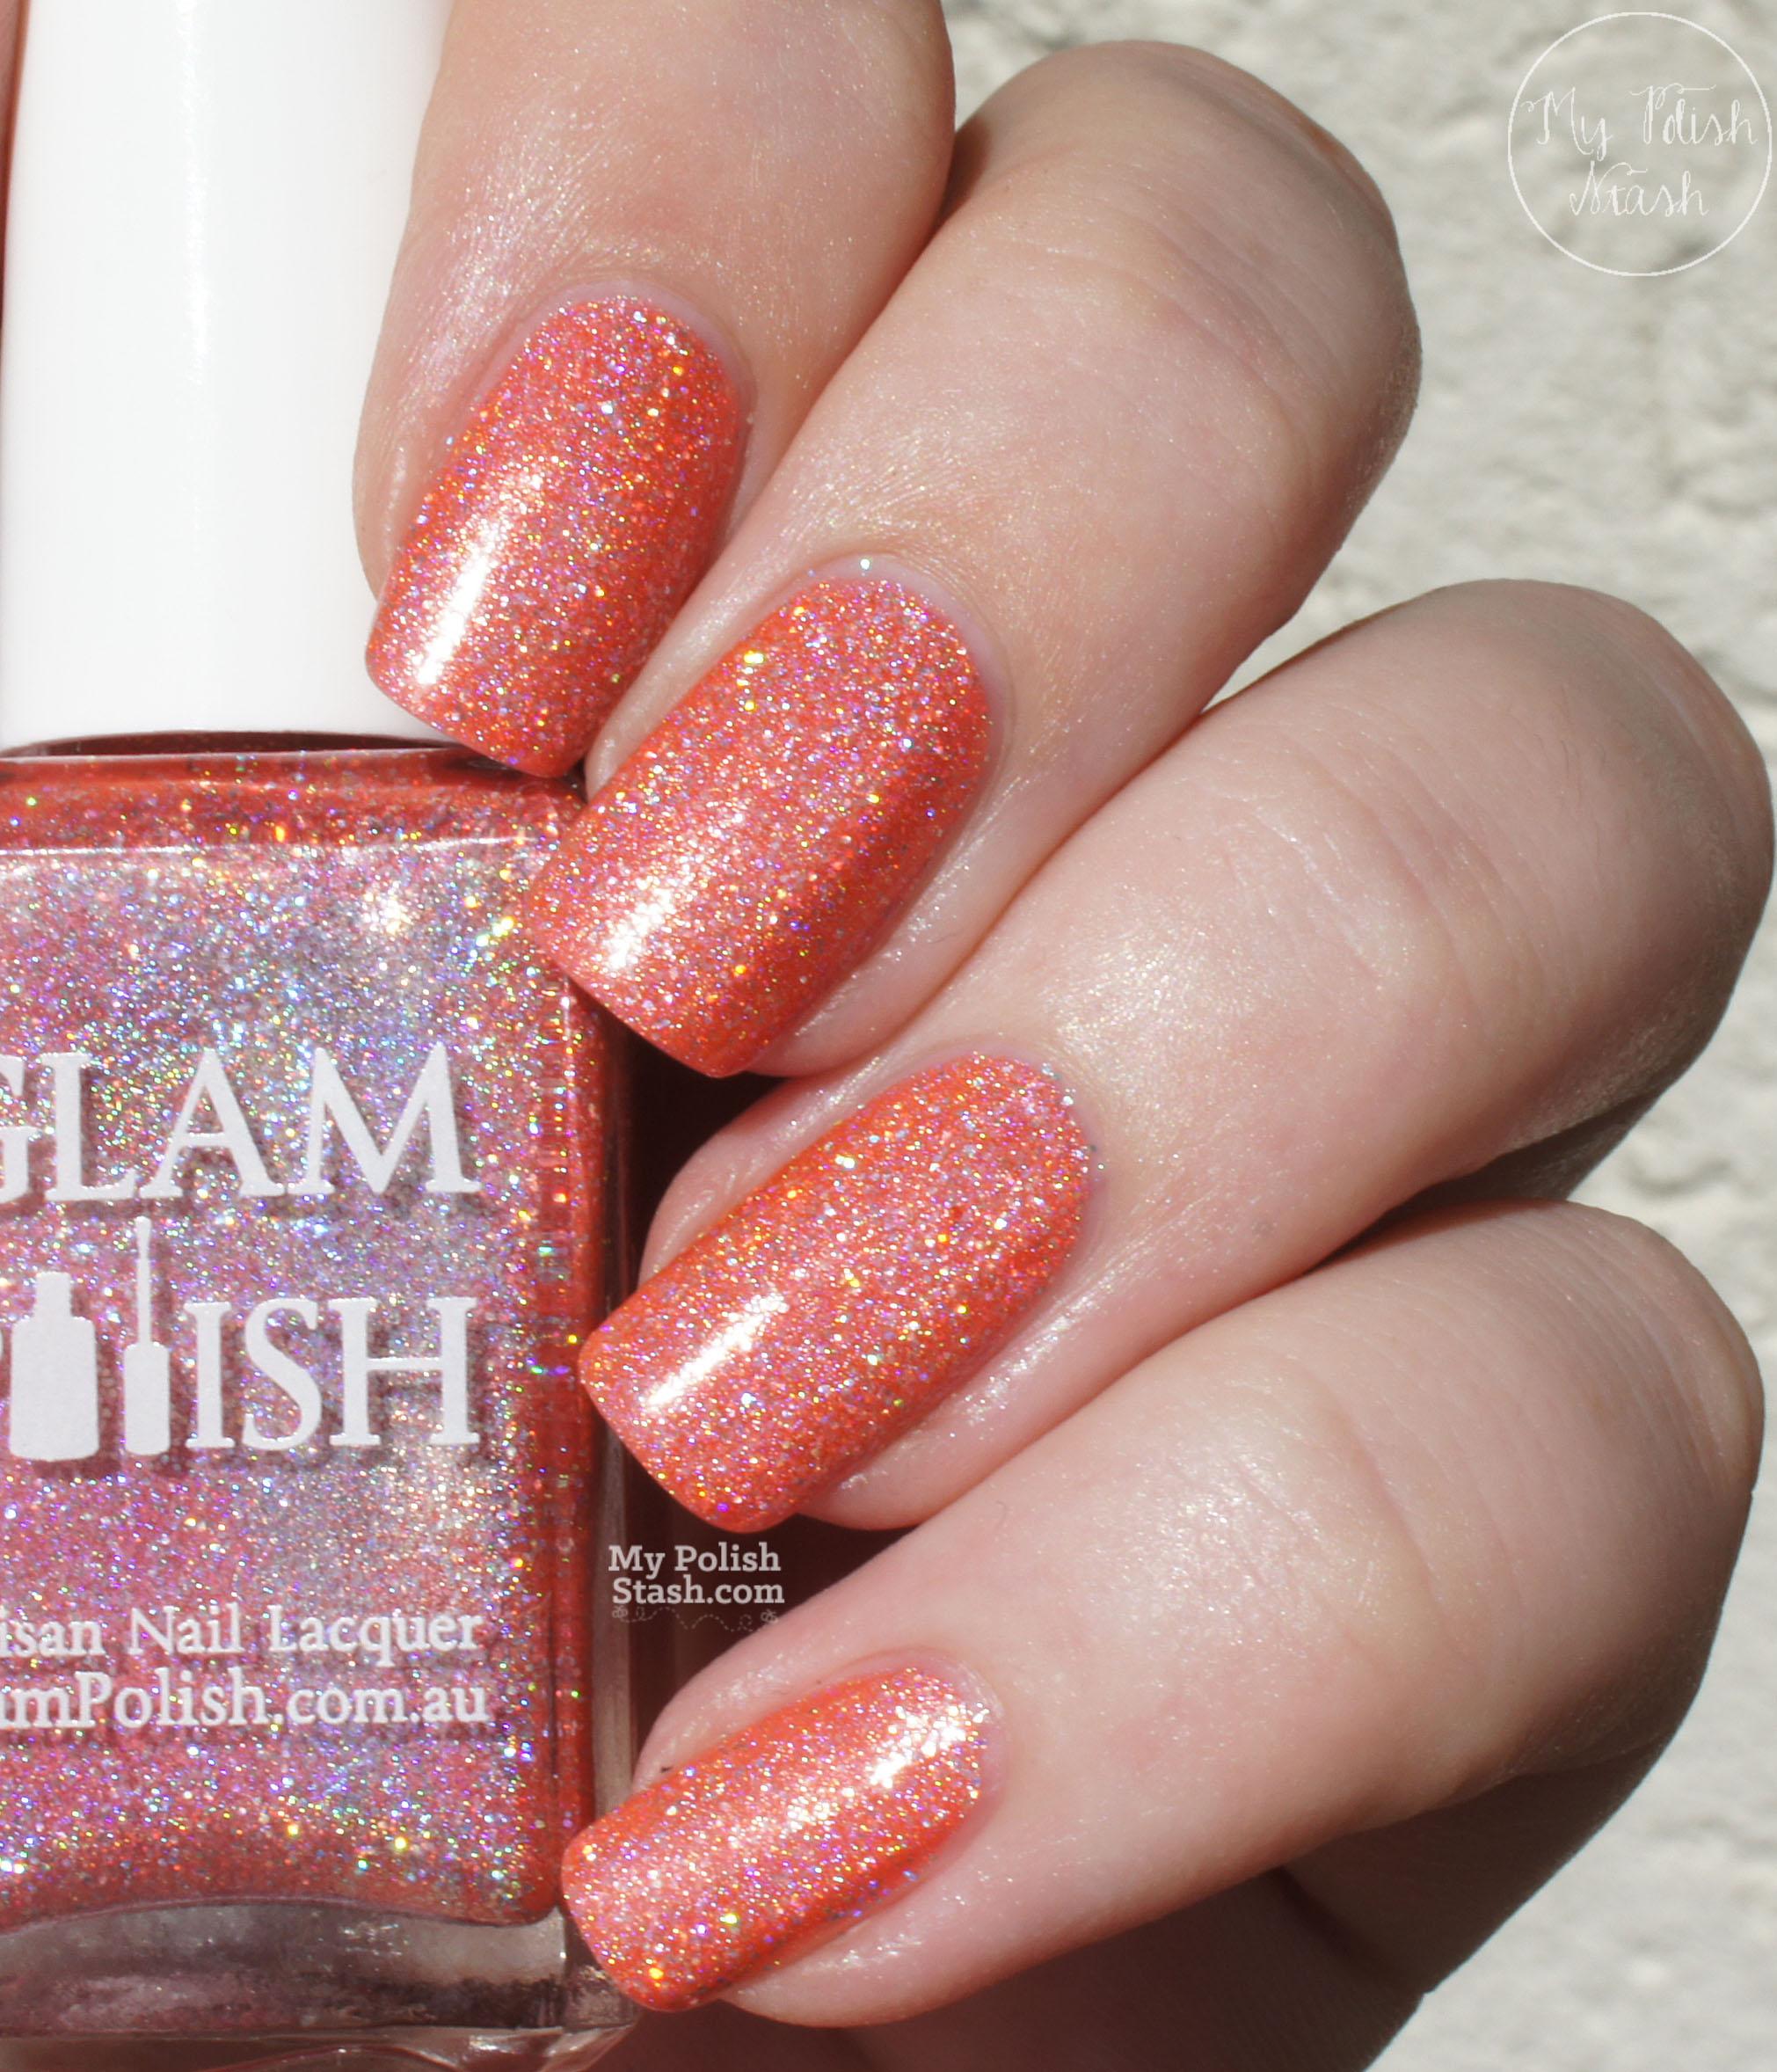 glam-polish-pop-swatch-5